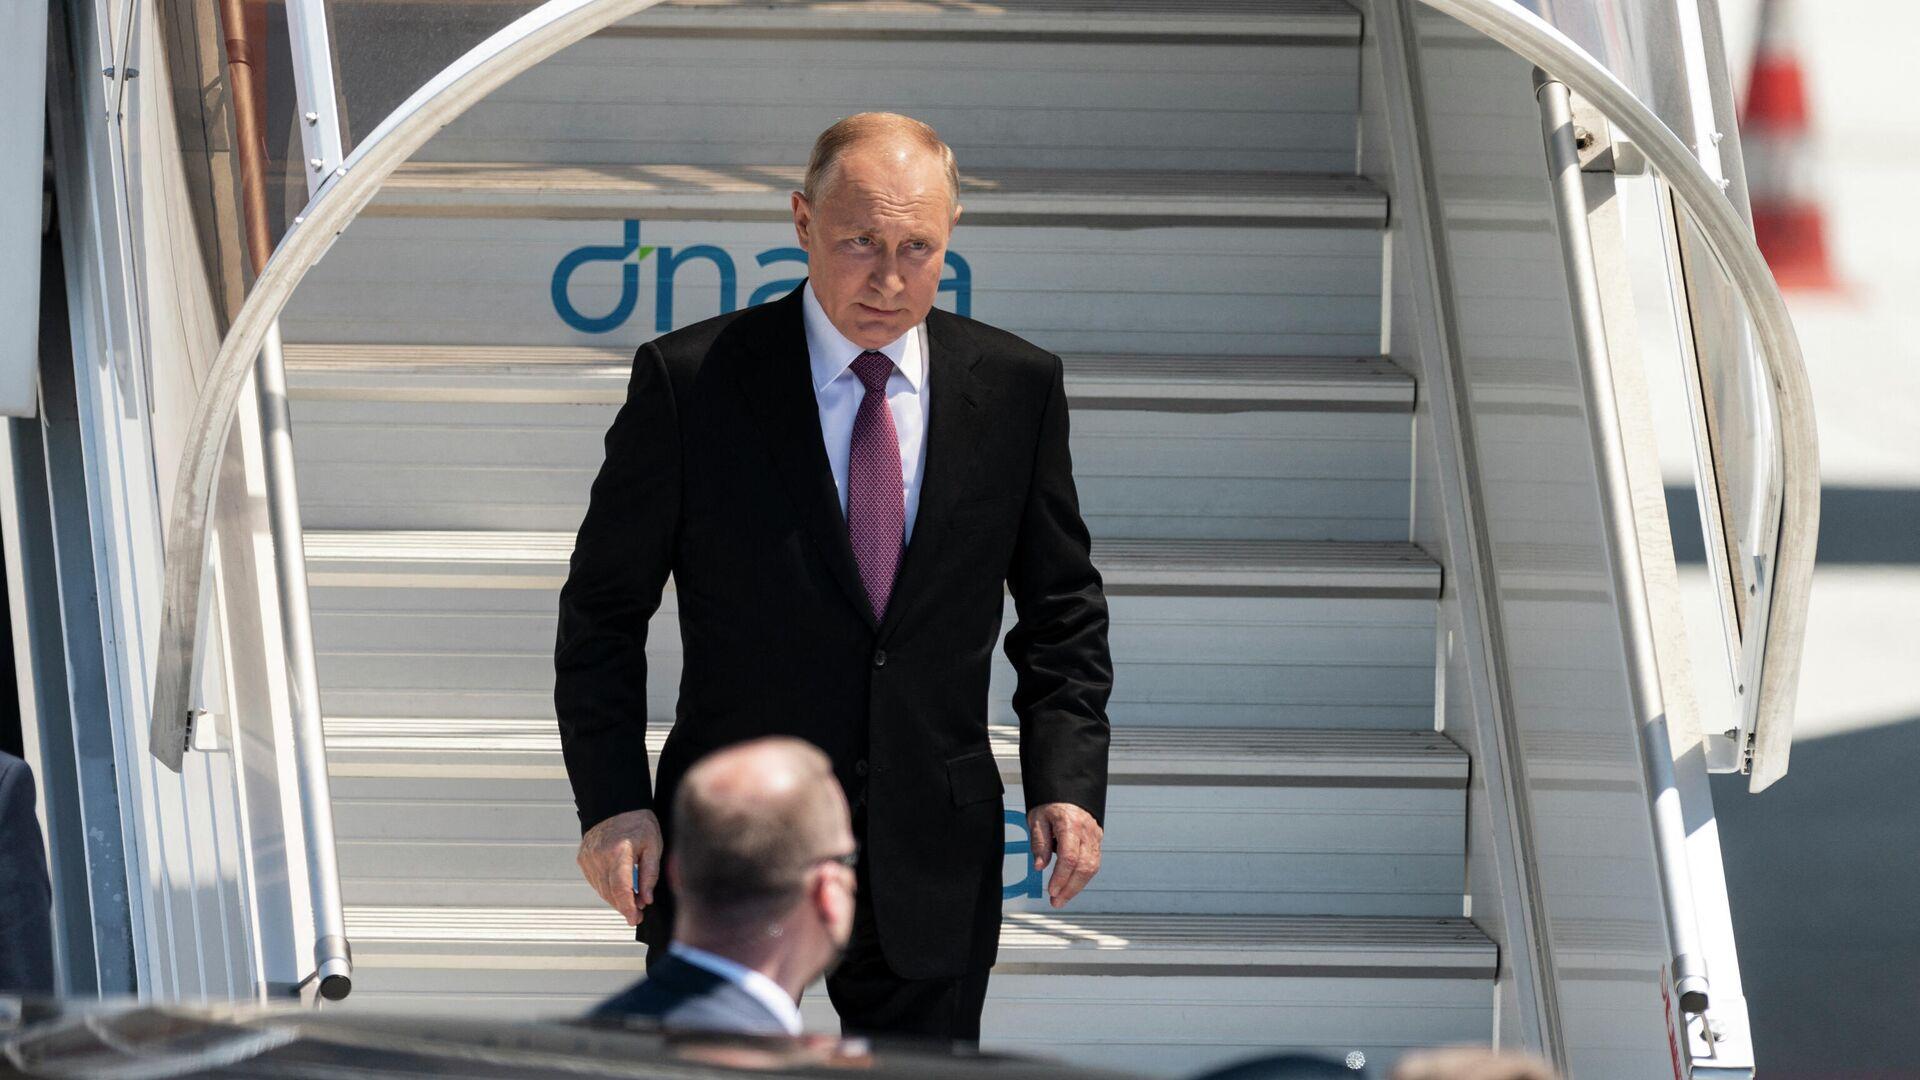 El presidente de Rusia, Vladímir Putin, llega a Ginebra  - Sputnik Mundo, 1920, 16.06.2021